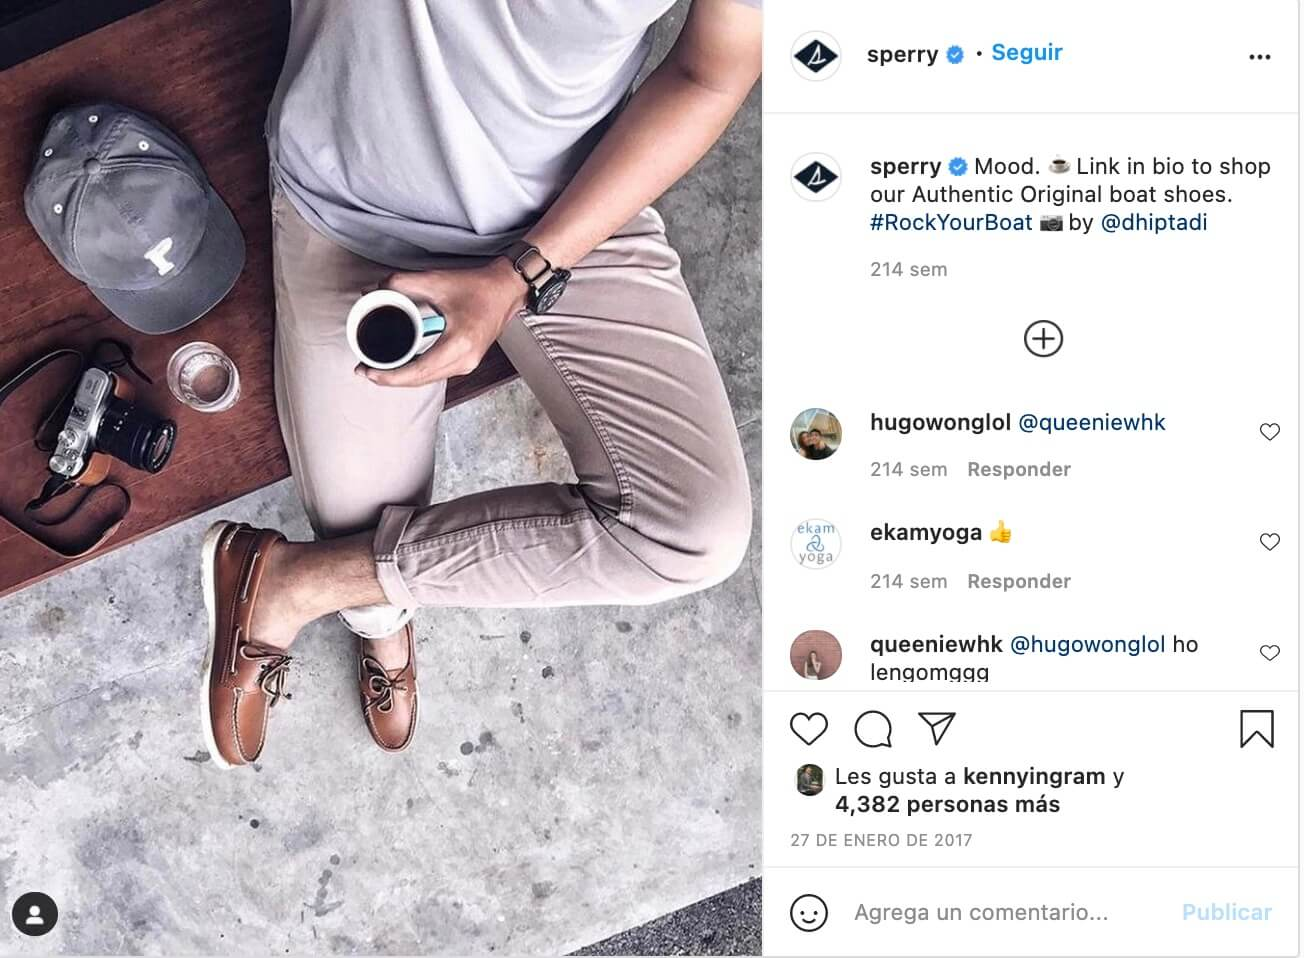 Marketing de influencia ejemplos, Sperry